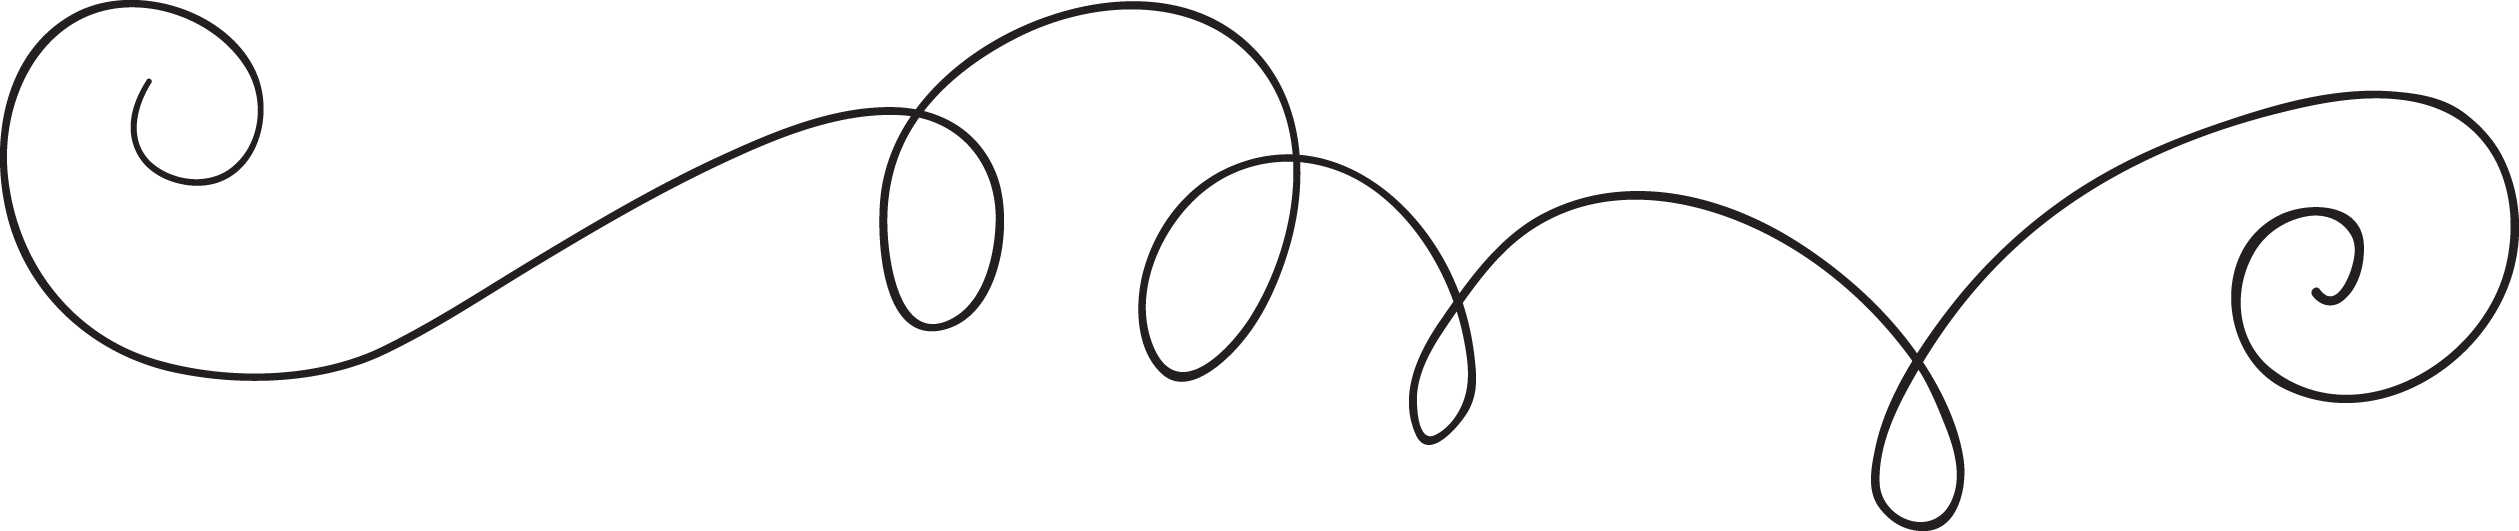 Sclingerman Timestandstill Swirl Png 2519 531 Decorative Lines Swirls Wattpad